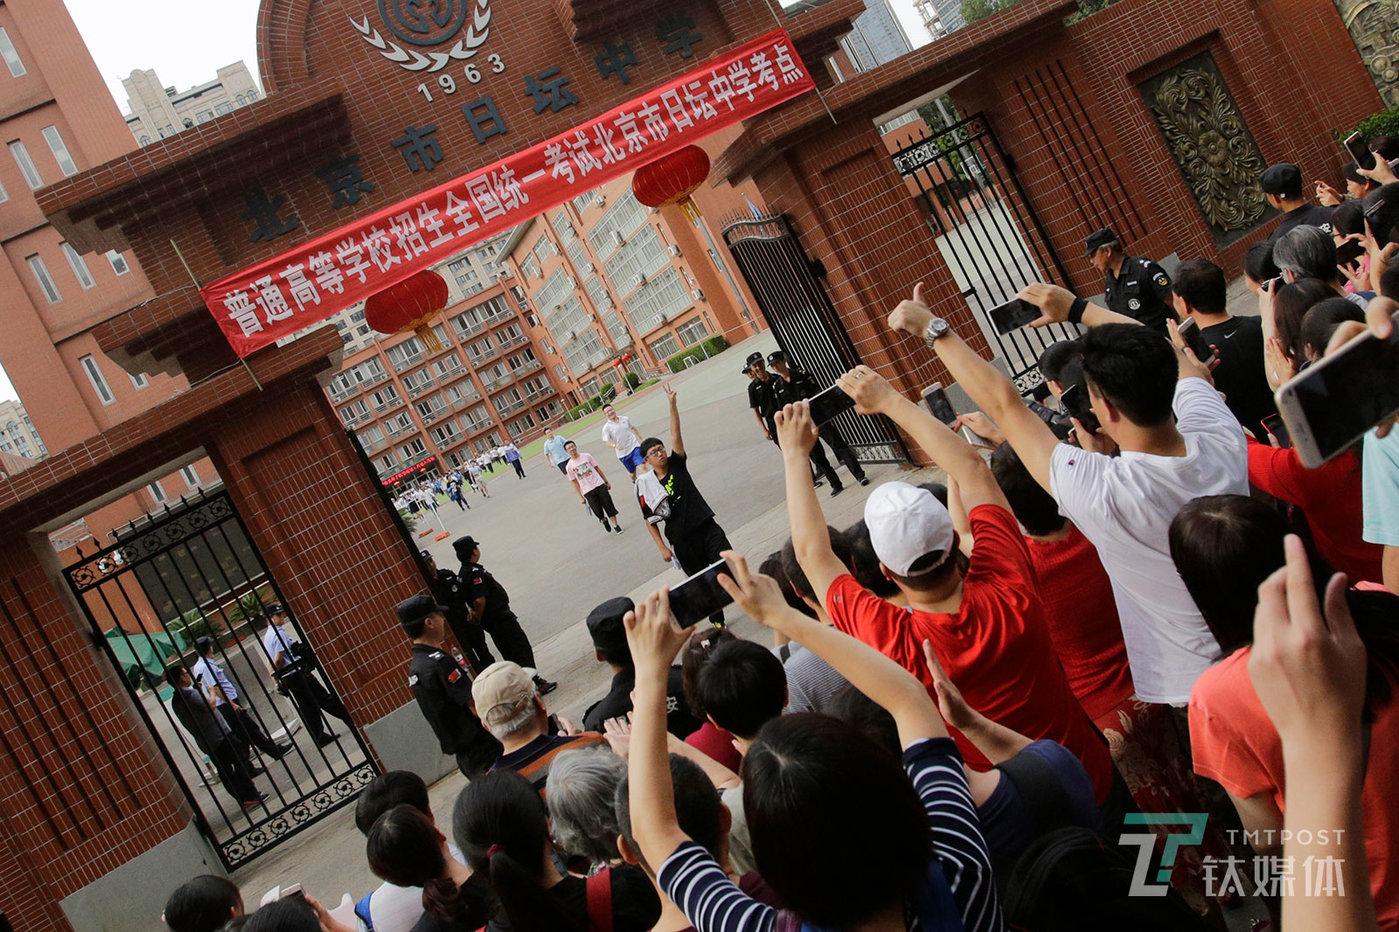 【Victory】6月8日下午,北京日坛中学,高考最后一科结束后,第一个走出考场的考生向校门外等候的家长打出胜利的手势。